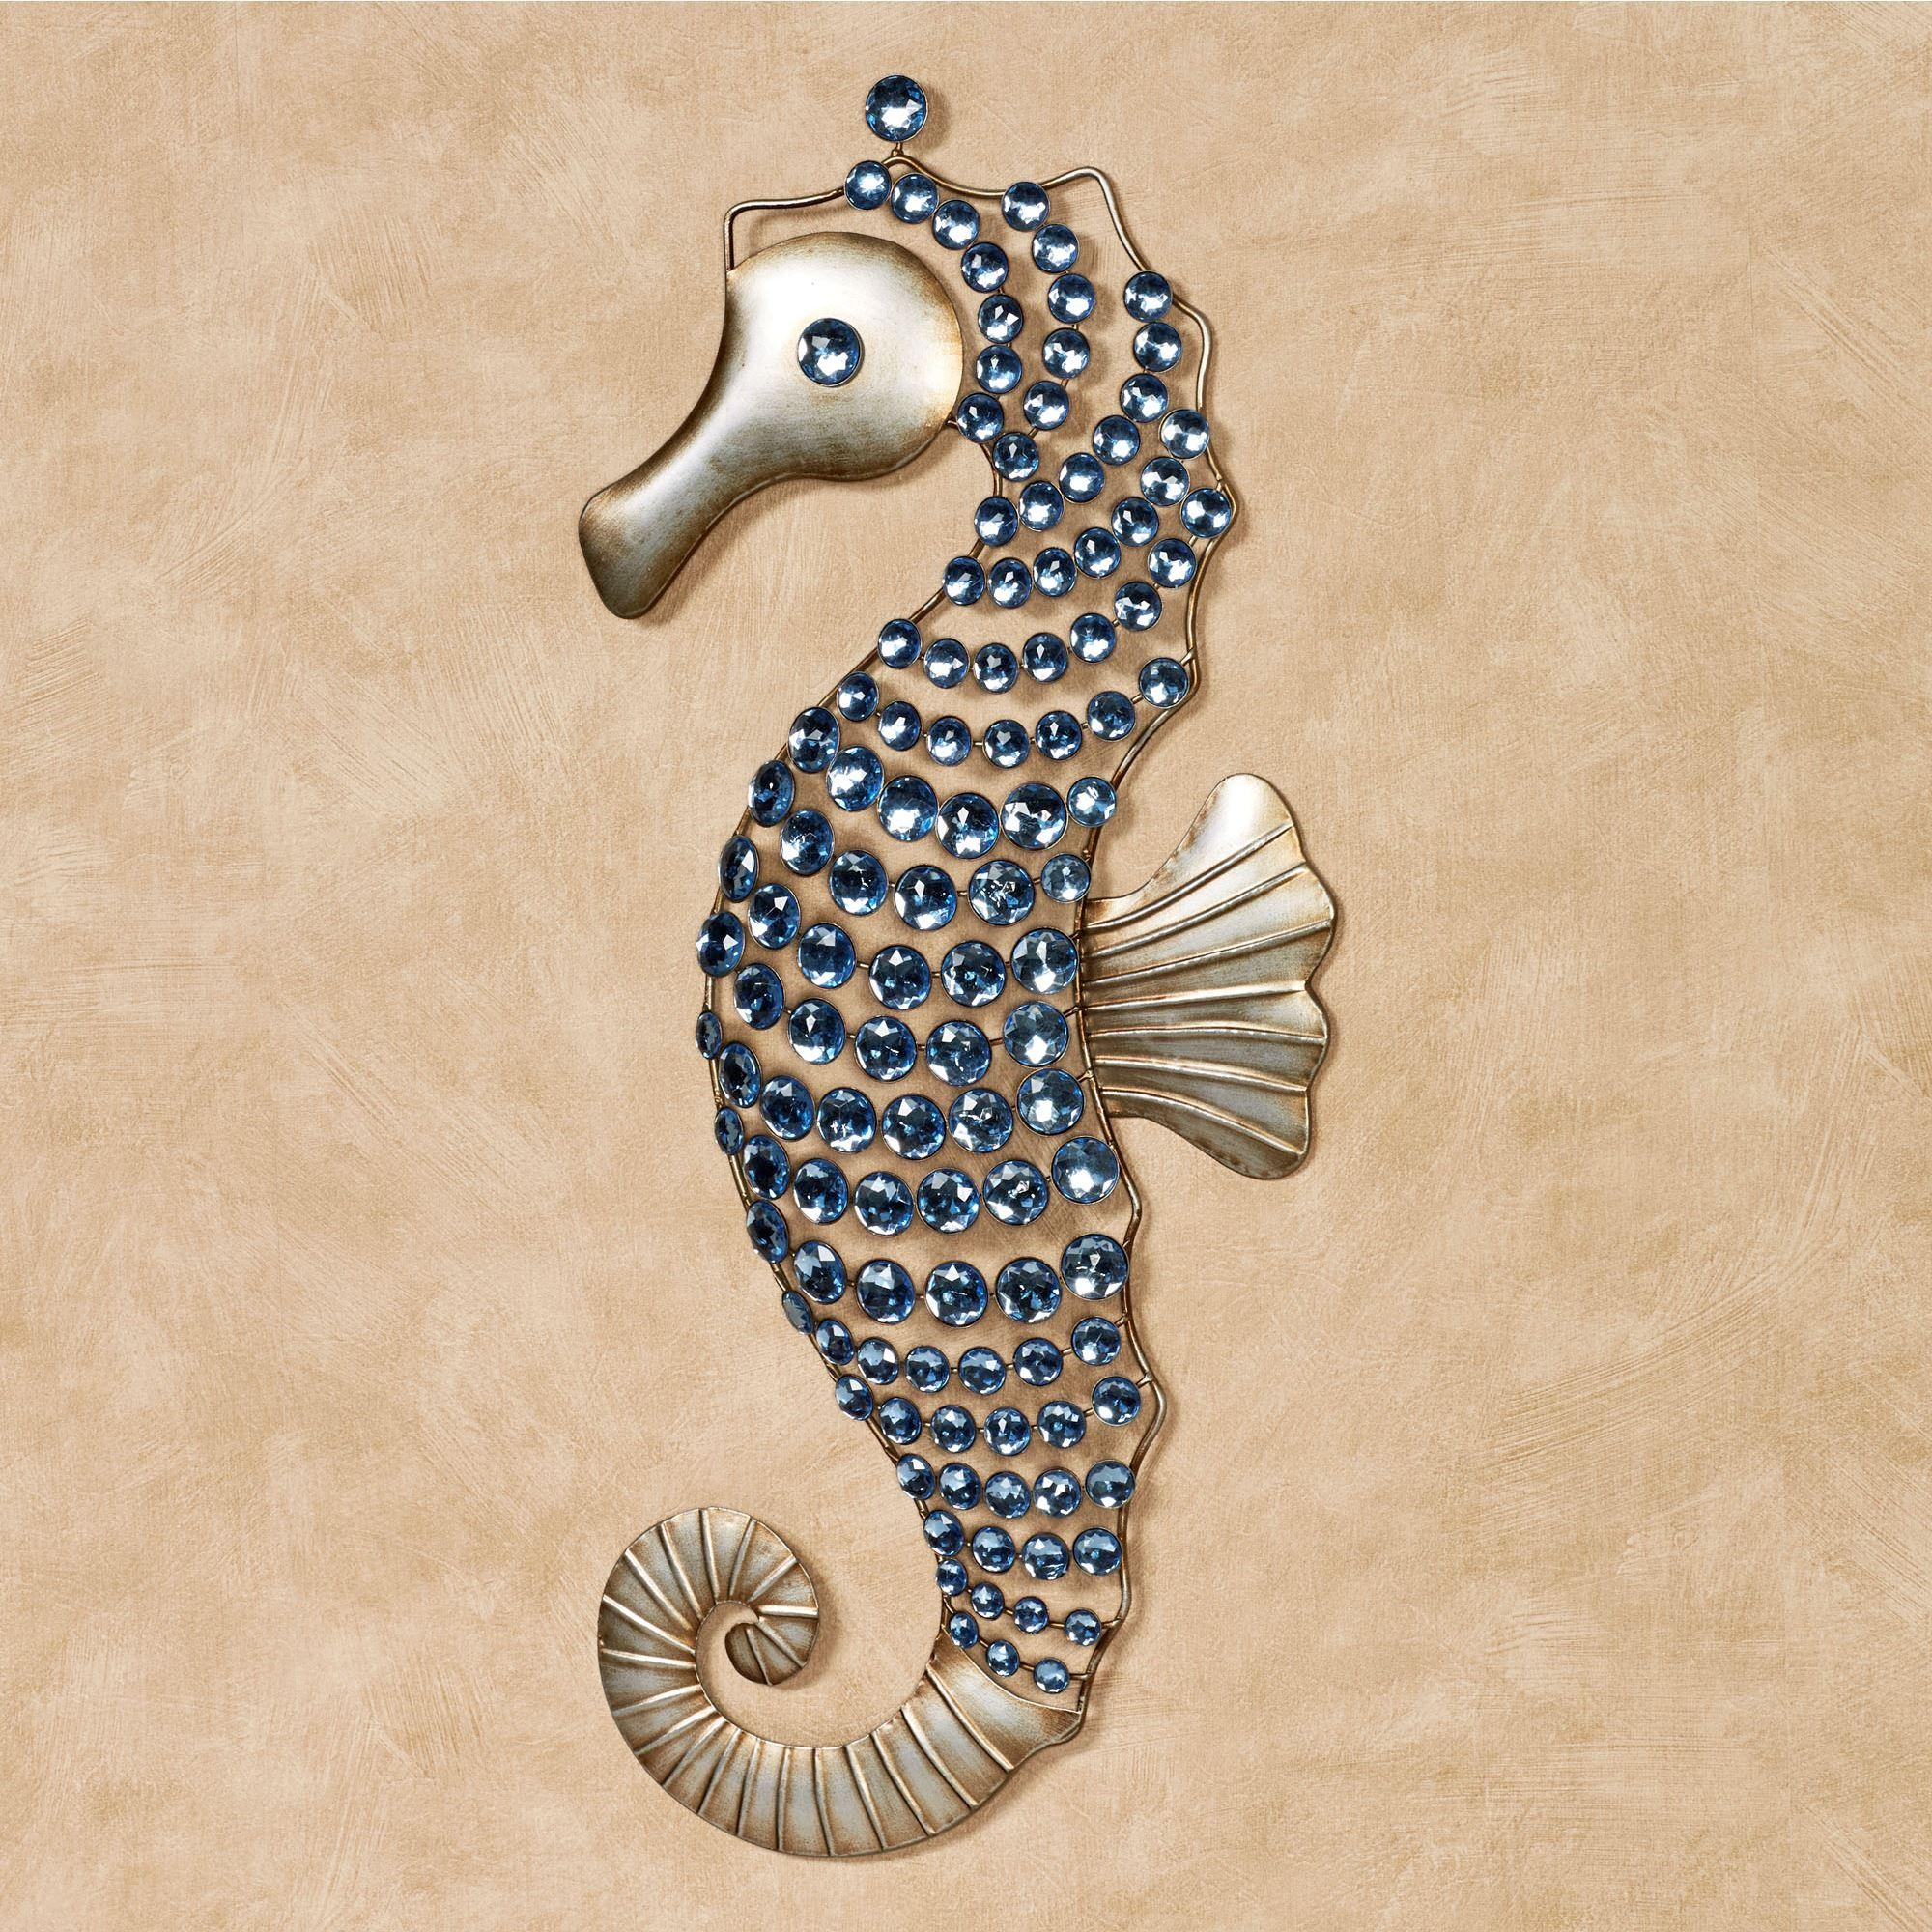 Seahorse Gems Metal Wall Art Regarding Sea Horse Wall Art (Image 9 of 20)